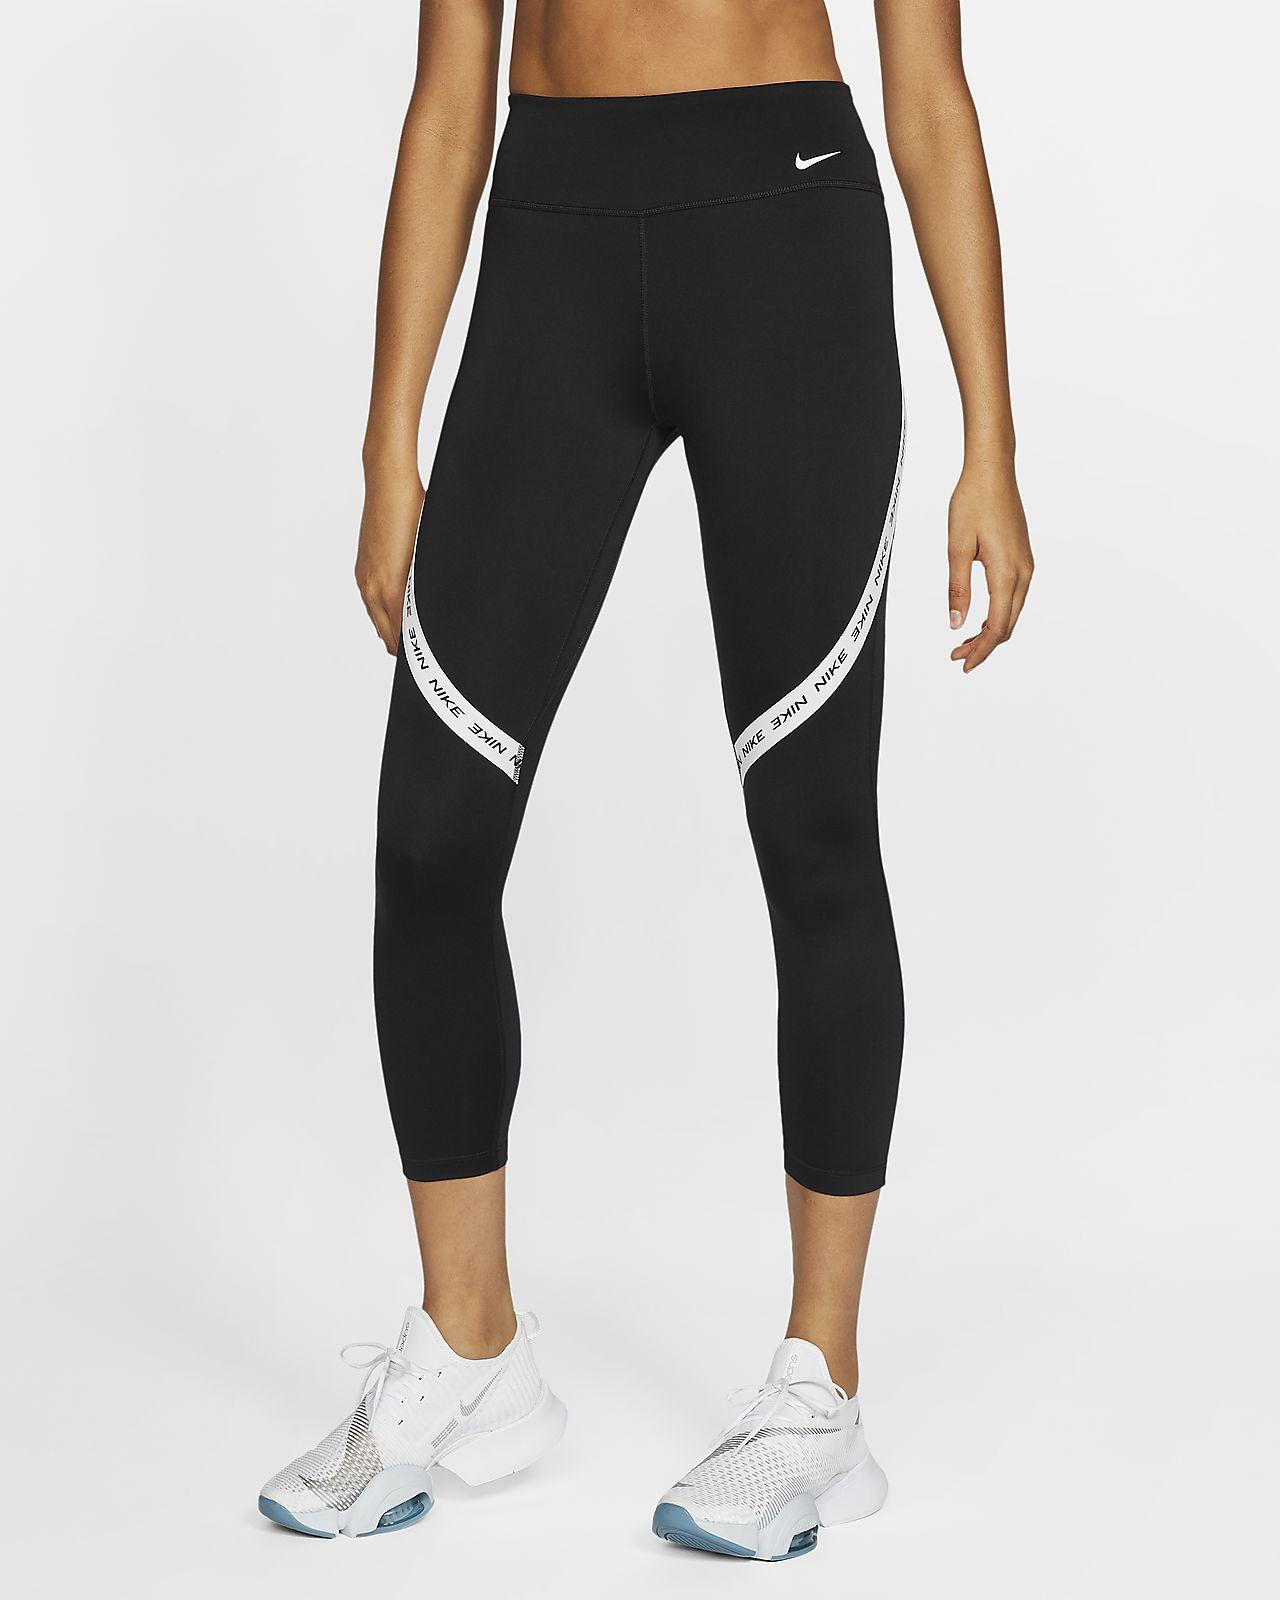 Nike One Capri met halfhoge taille voor dames